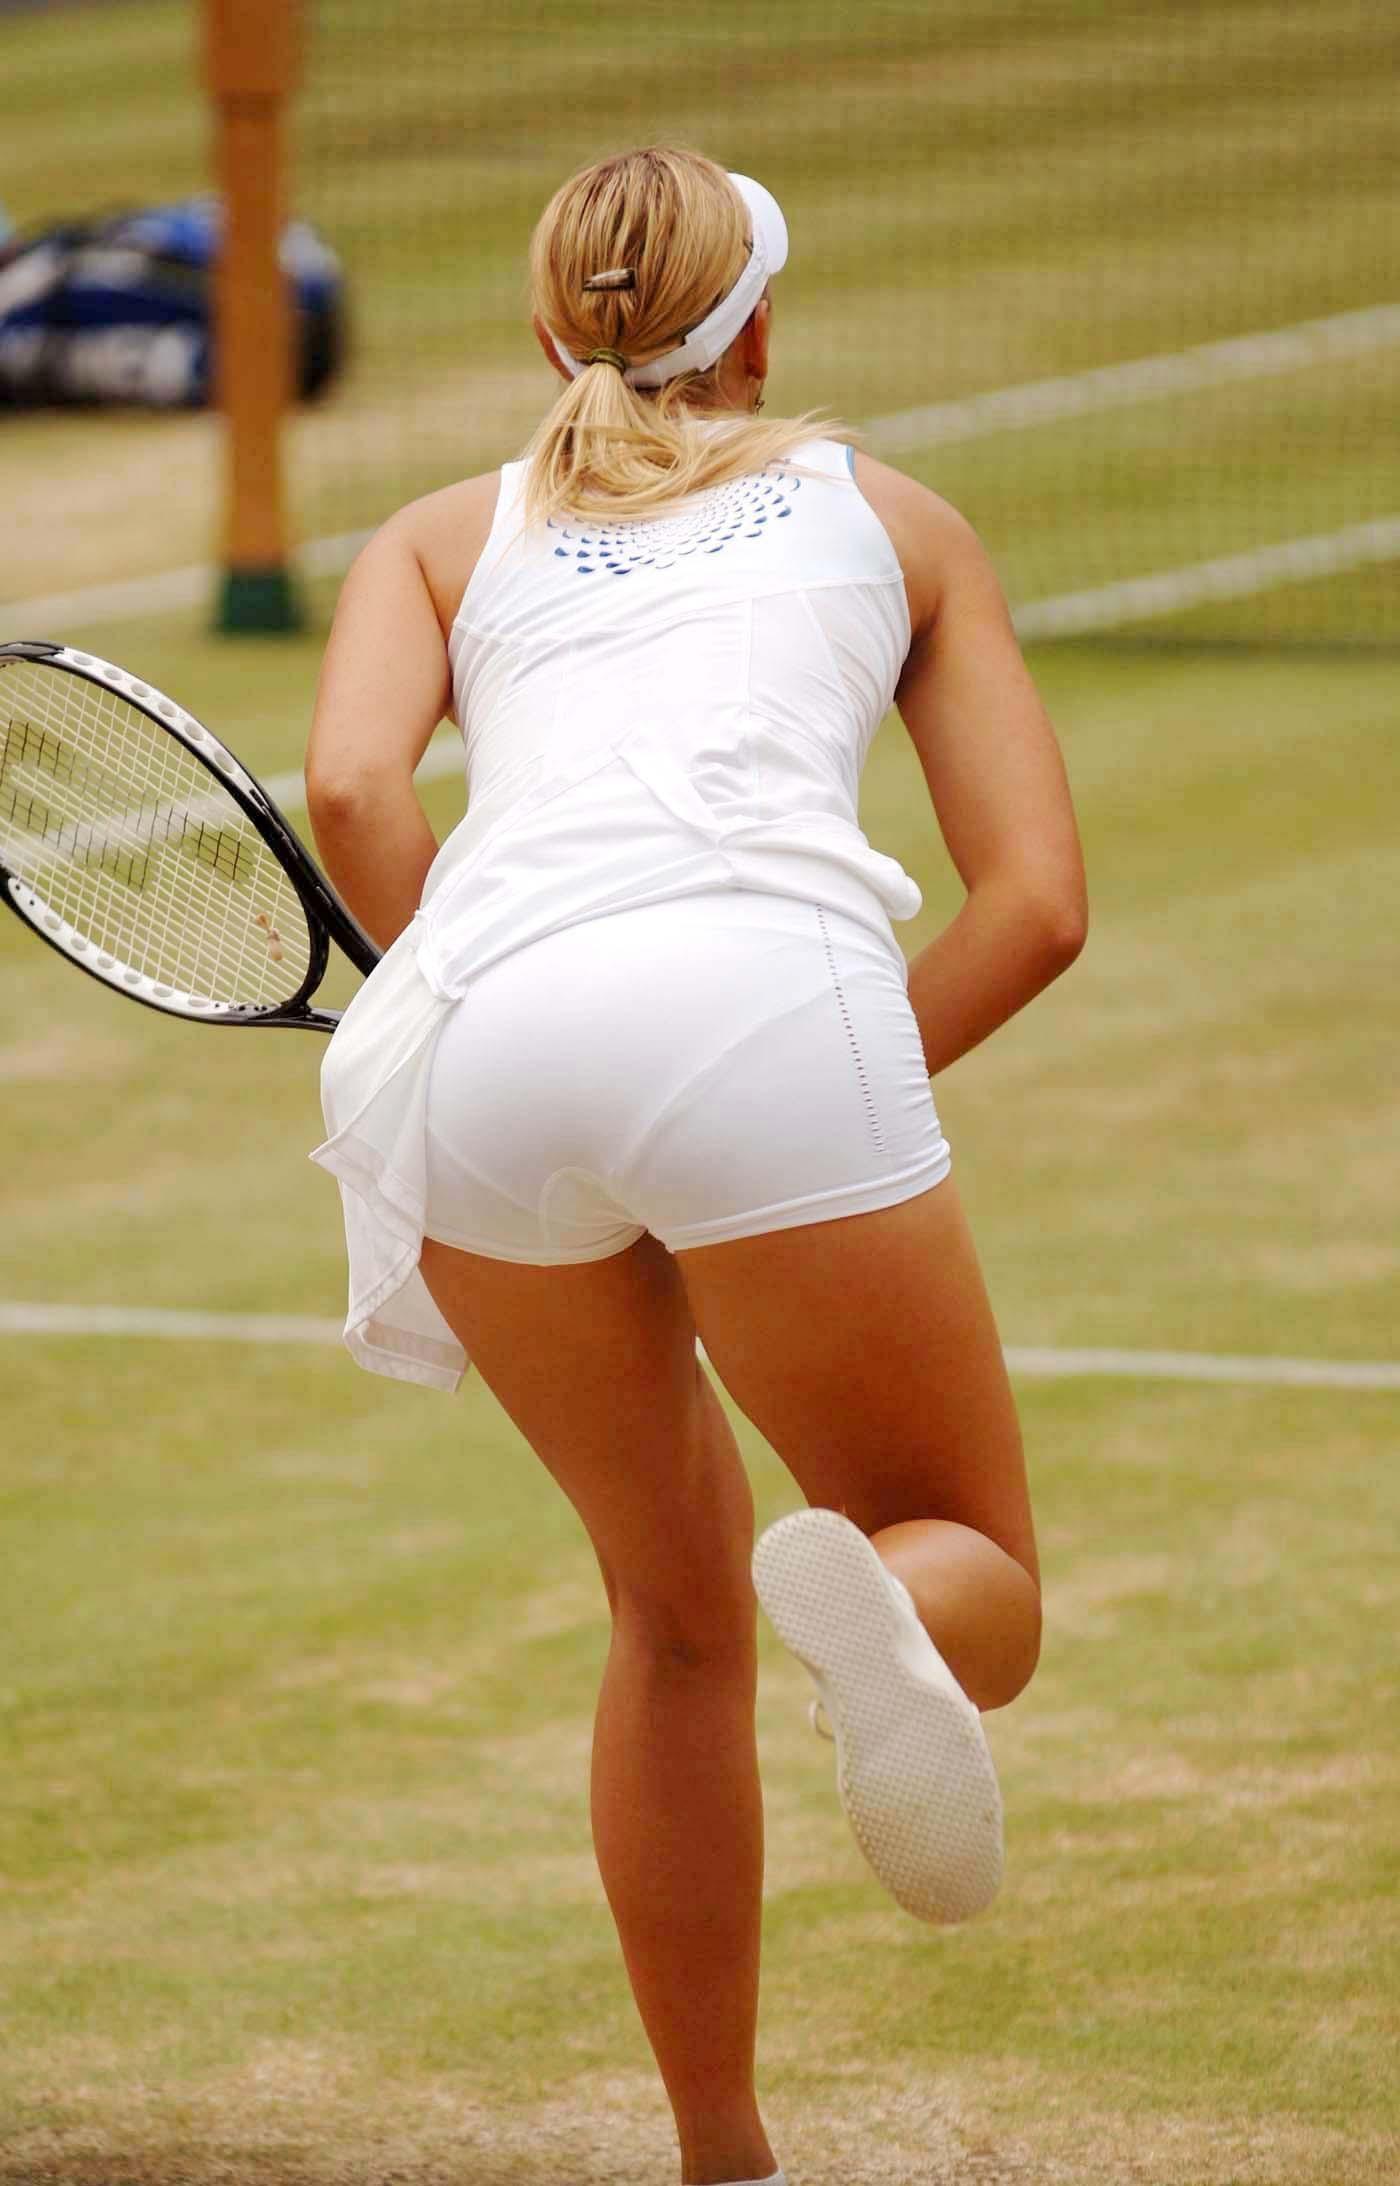 Free porn tennis upskirt down blouse